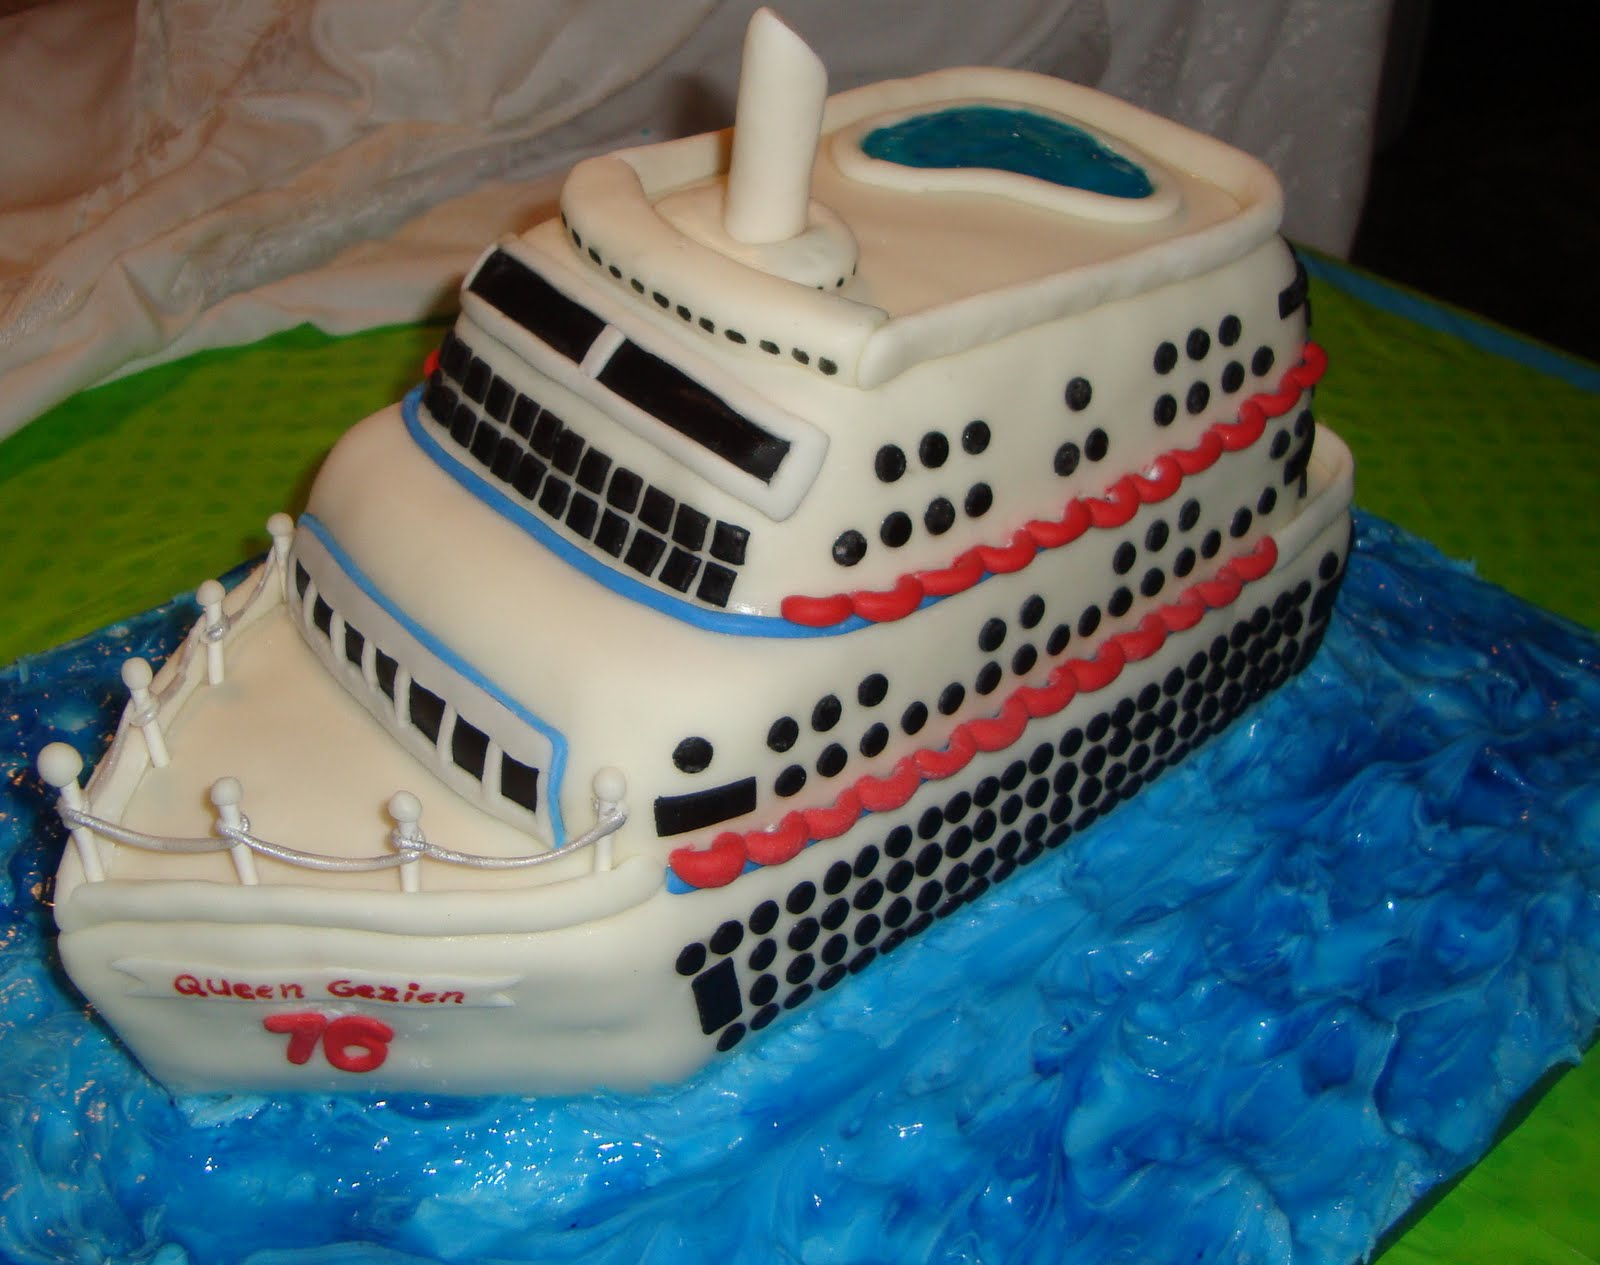 Brighams Cake House Cruise Ship - Cruise ship cake